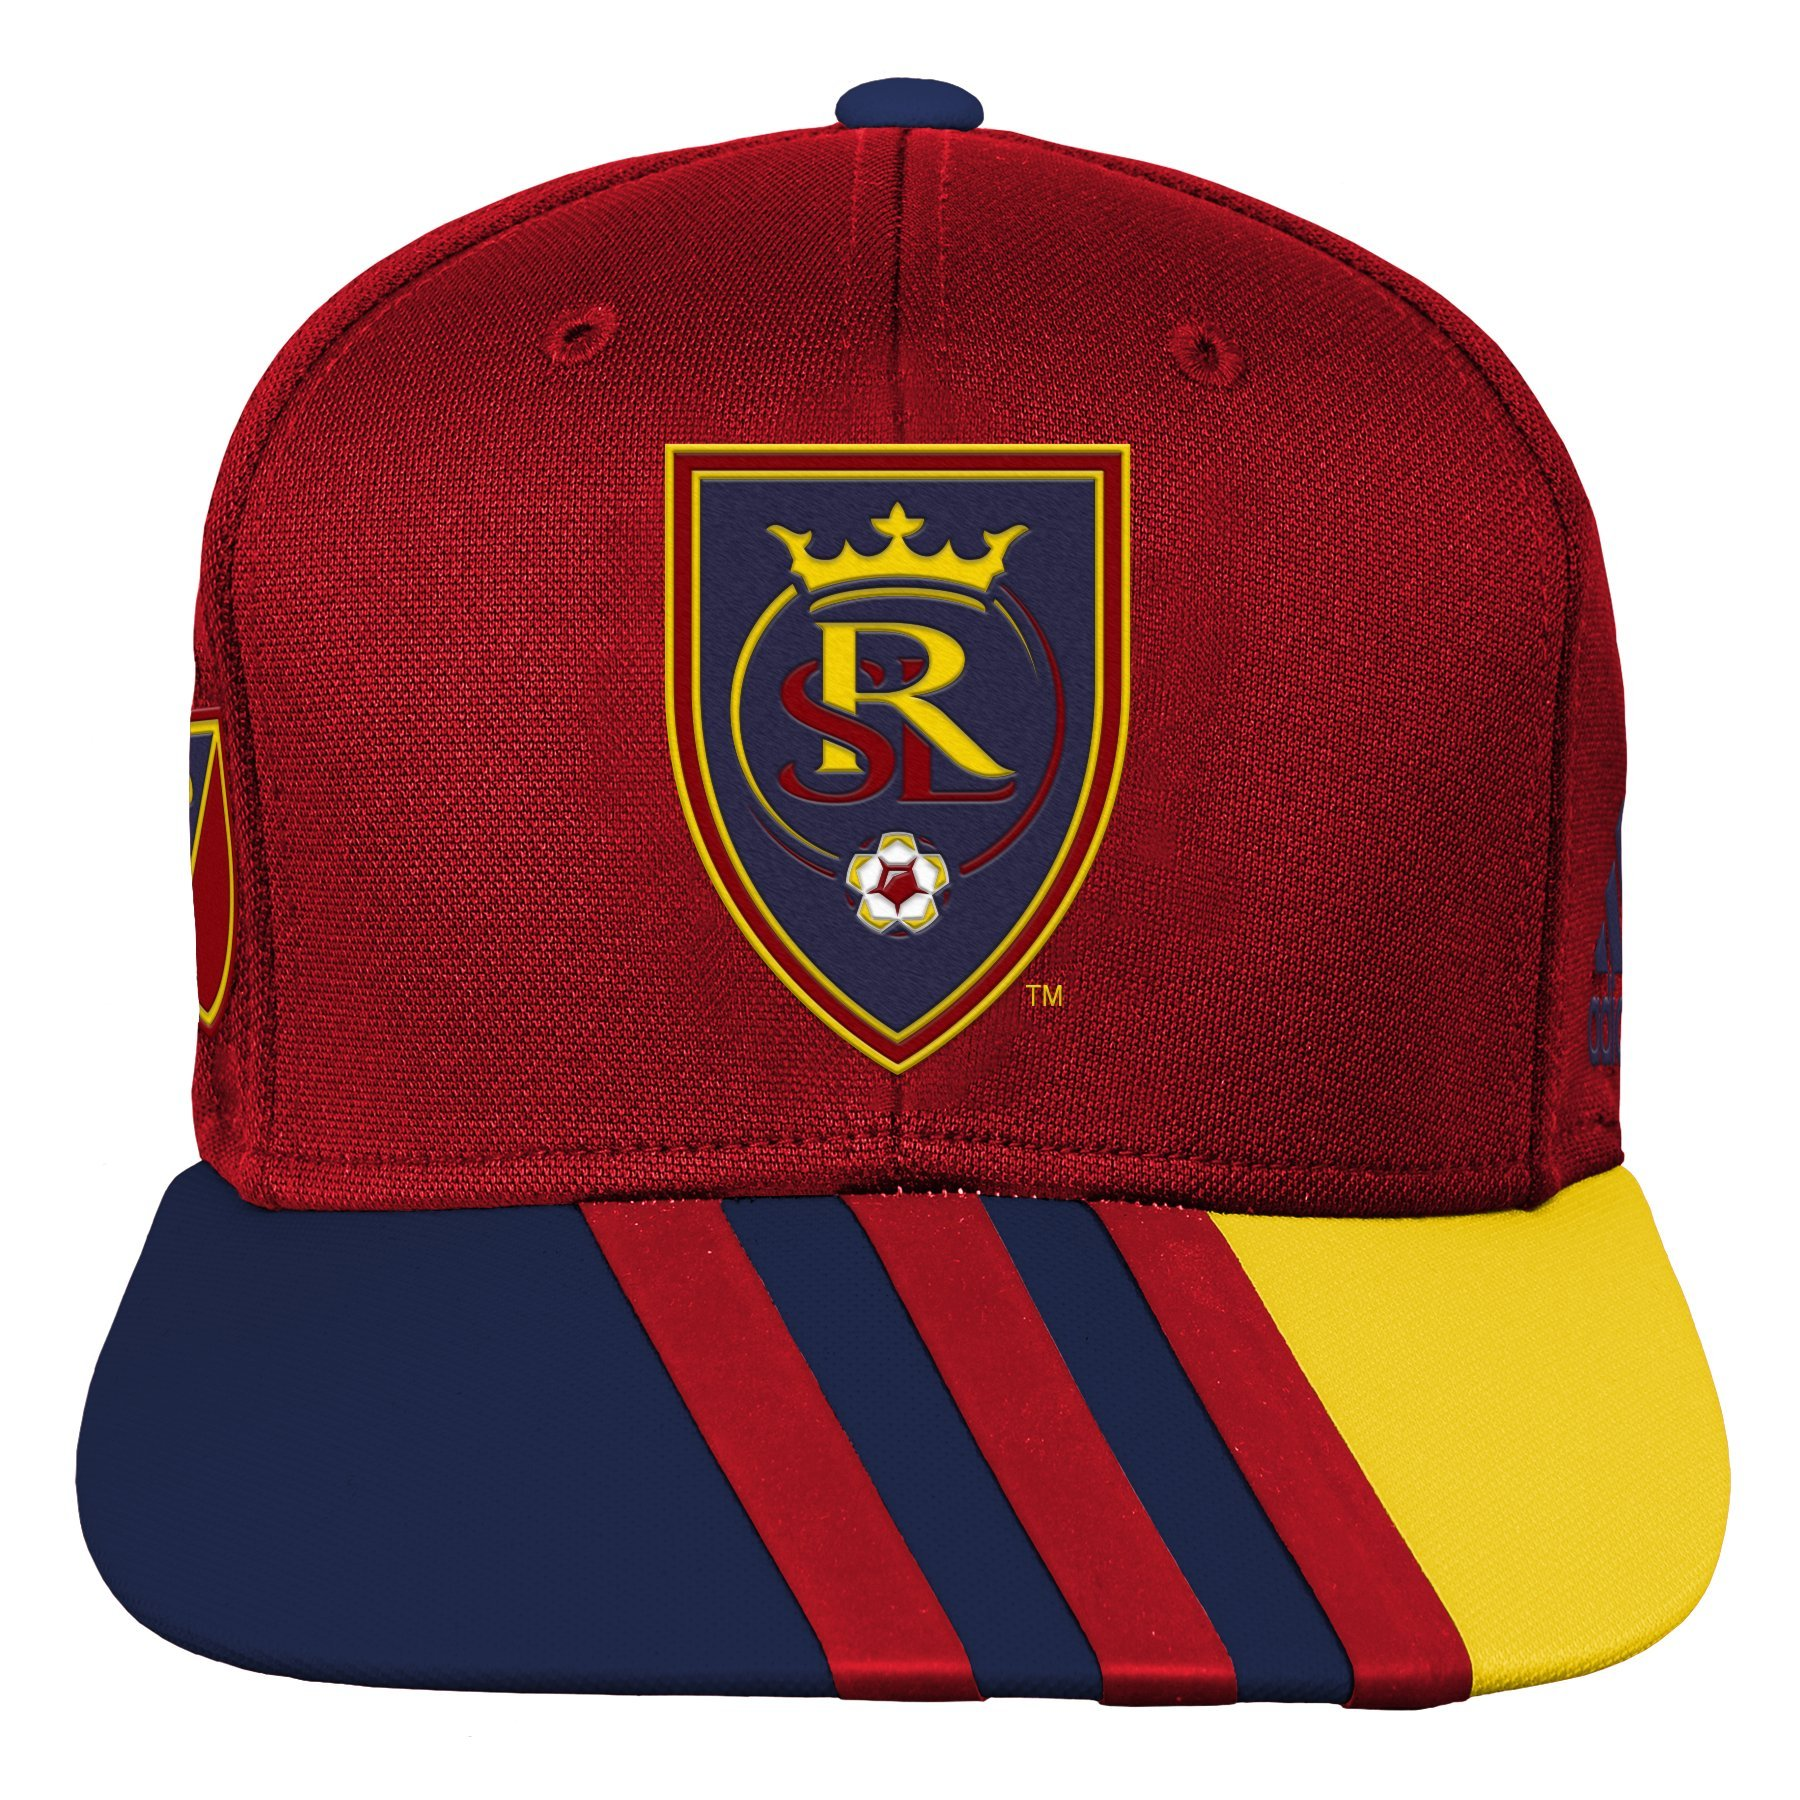 Outerstuff MLS Real Salt Lake R S8FMK Youth Boys Flatbrim Snapback, One Size (8), Crimson Red